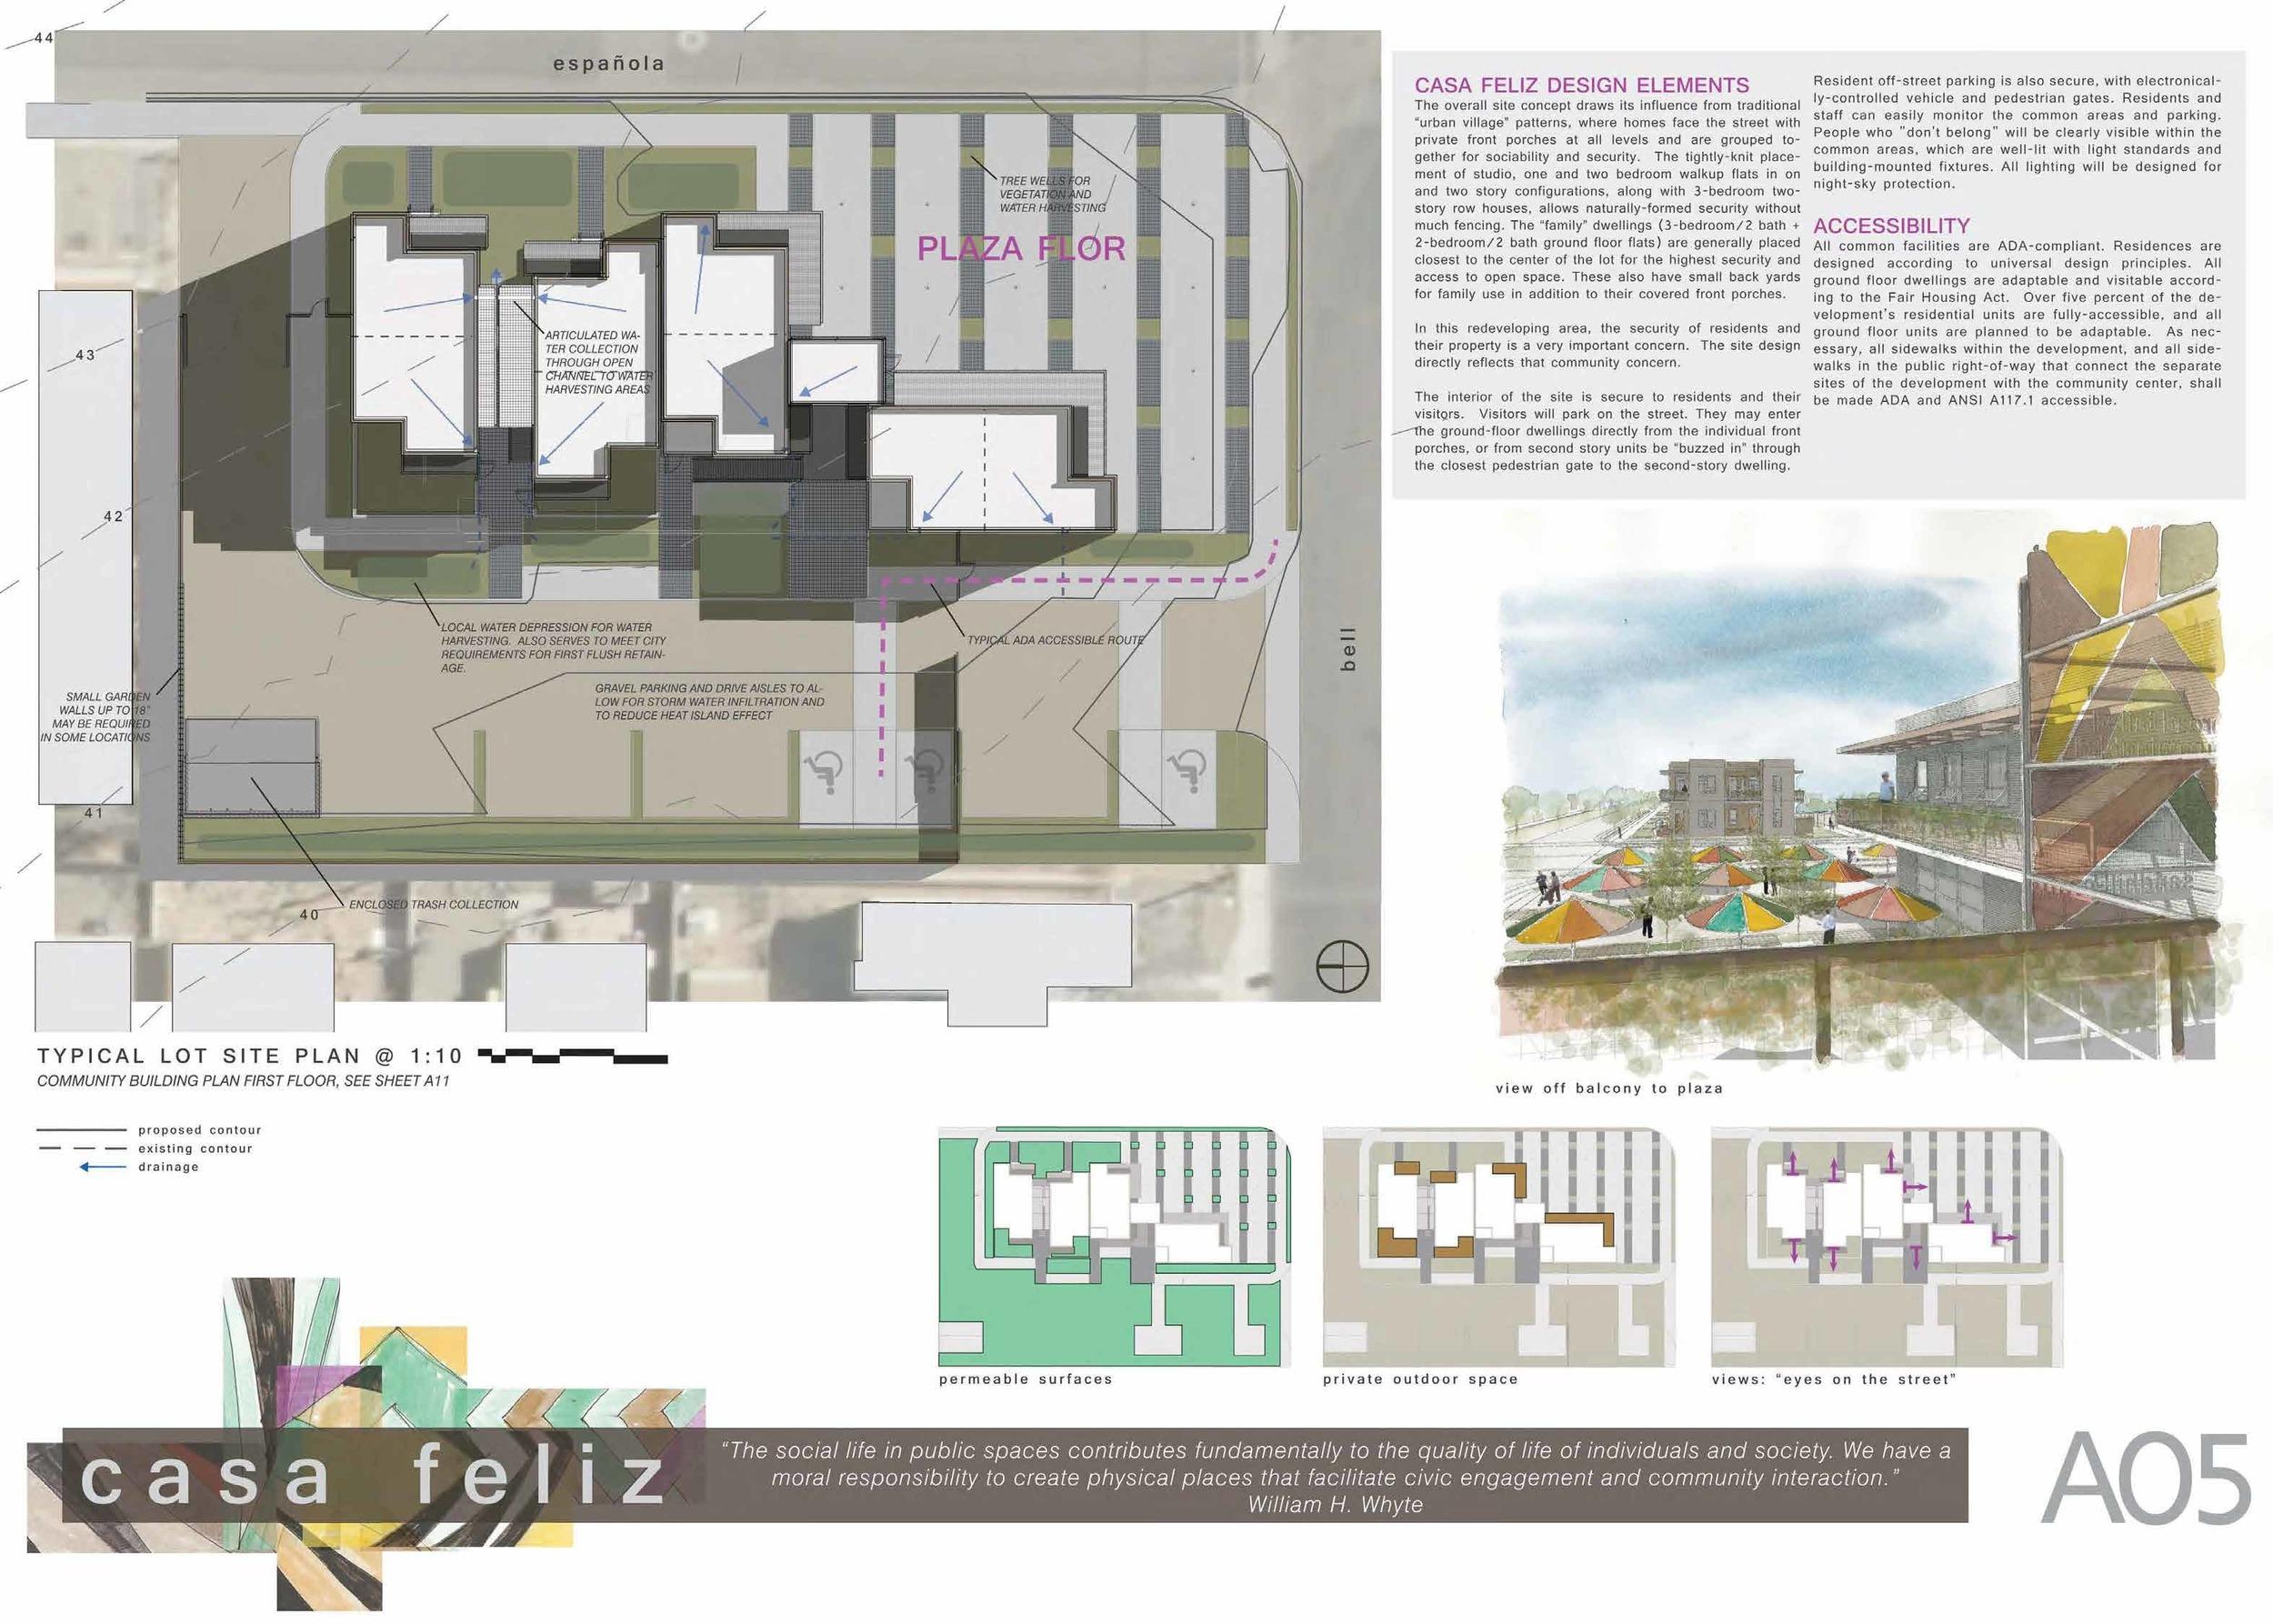 GAHP Casa Feliz MFA Design Competition Submittal 2015-02-02_Page_05.jpg